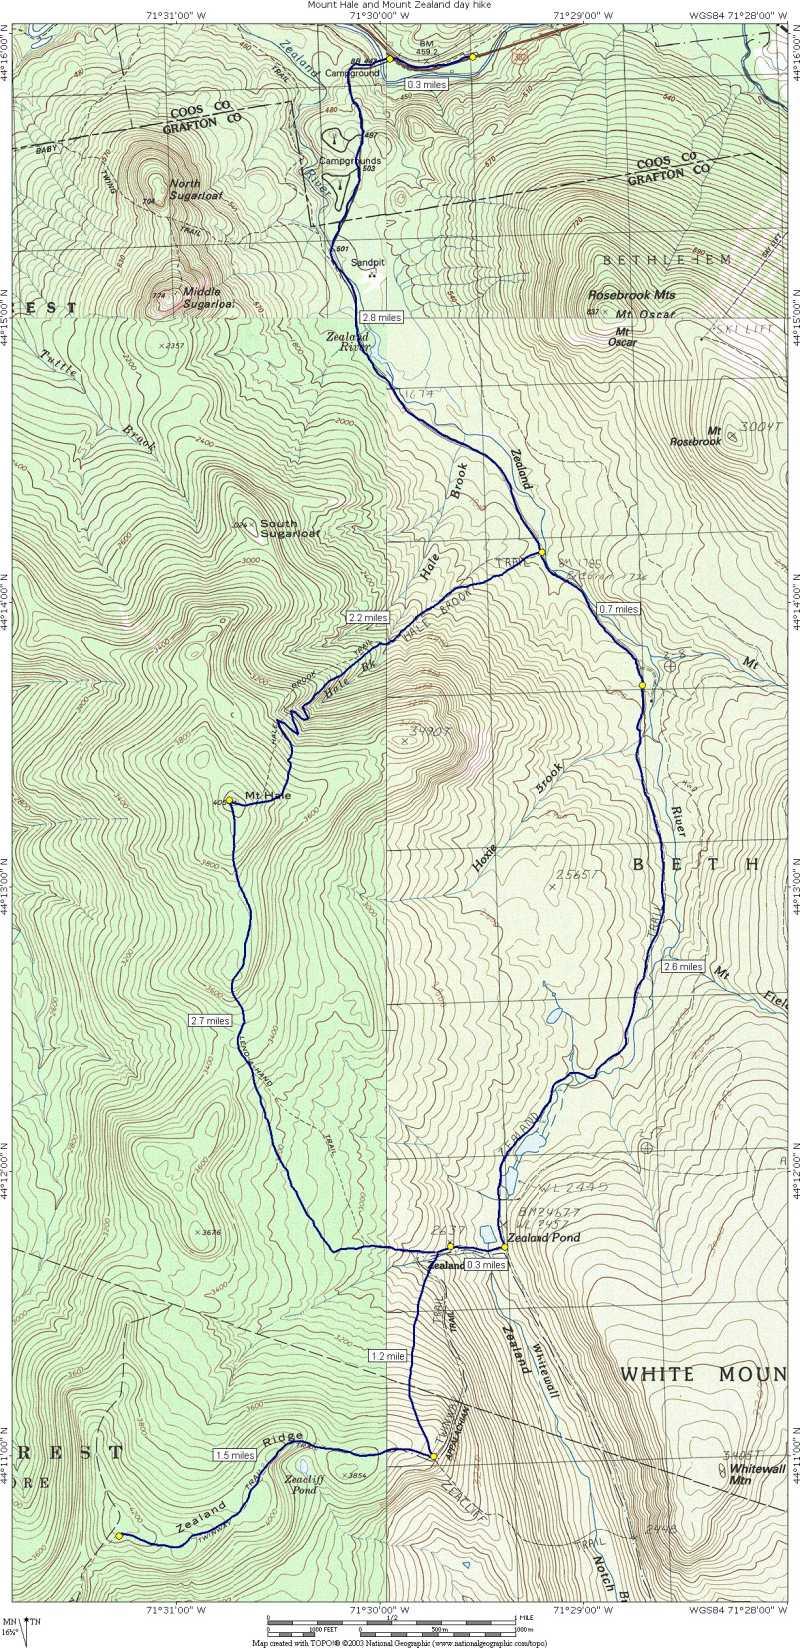 Mount Hale and Zealand Mountain day hike on jefferson trail map, franconia ridge trail map, nelson trail map, ethan pond trail map, bristol trail map, china trail map, peru trail map, victoria trail map, turkey trail map, austria trail map, galehead trail map, tobago trail map, germany trail map, flume trail map, mexico trail map, fredericton trail map, liberty trail map, jamaica trail map,